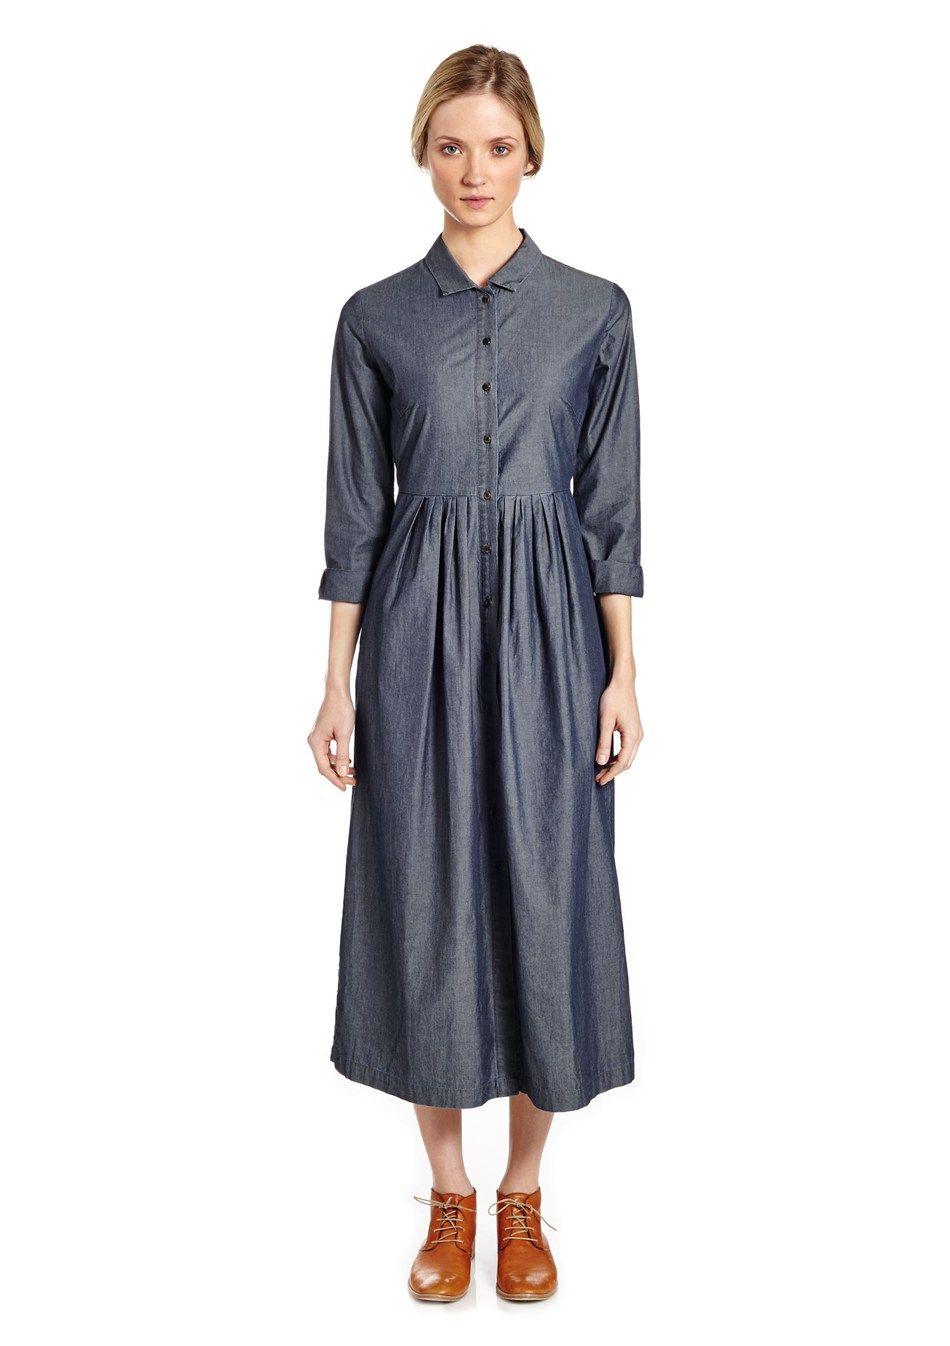 Chambray shirt dress looks pinterest simple clothing chambray